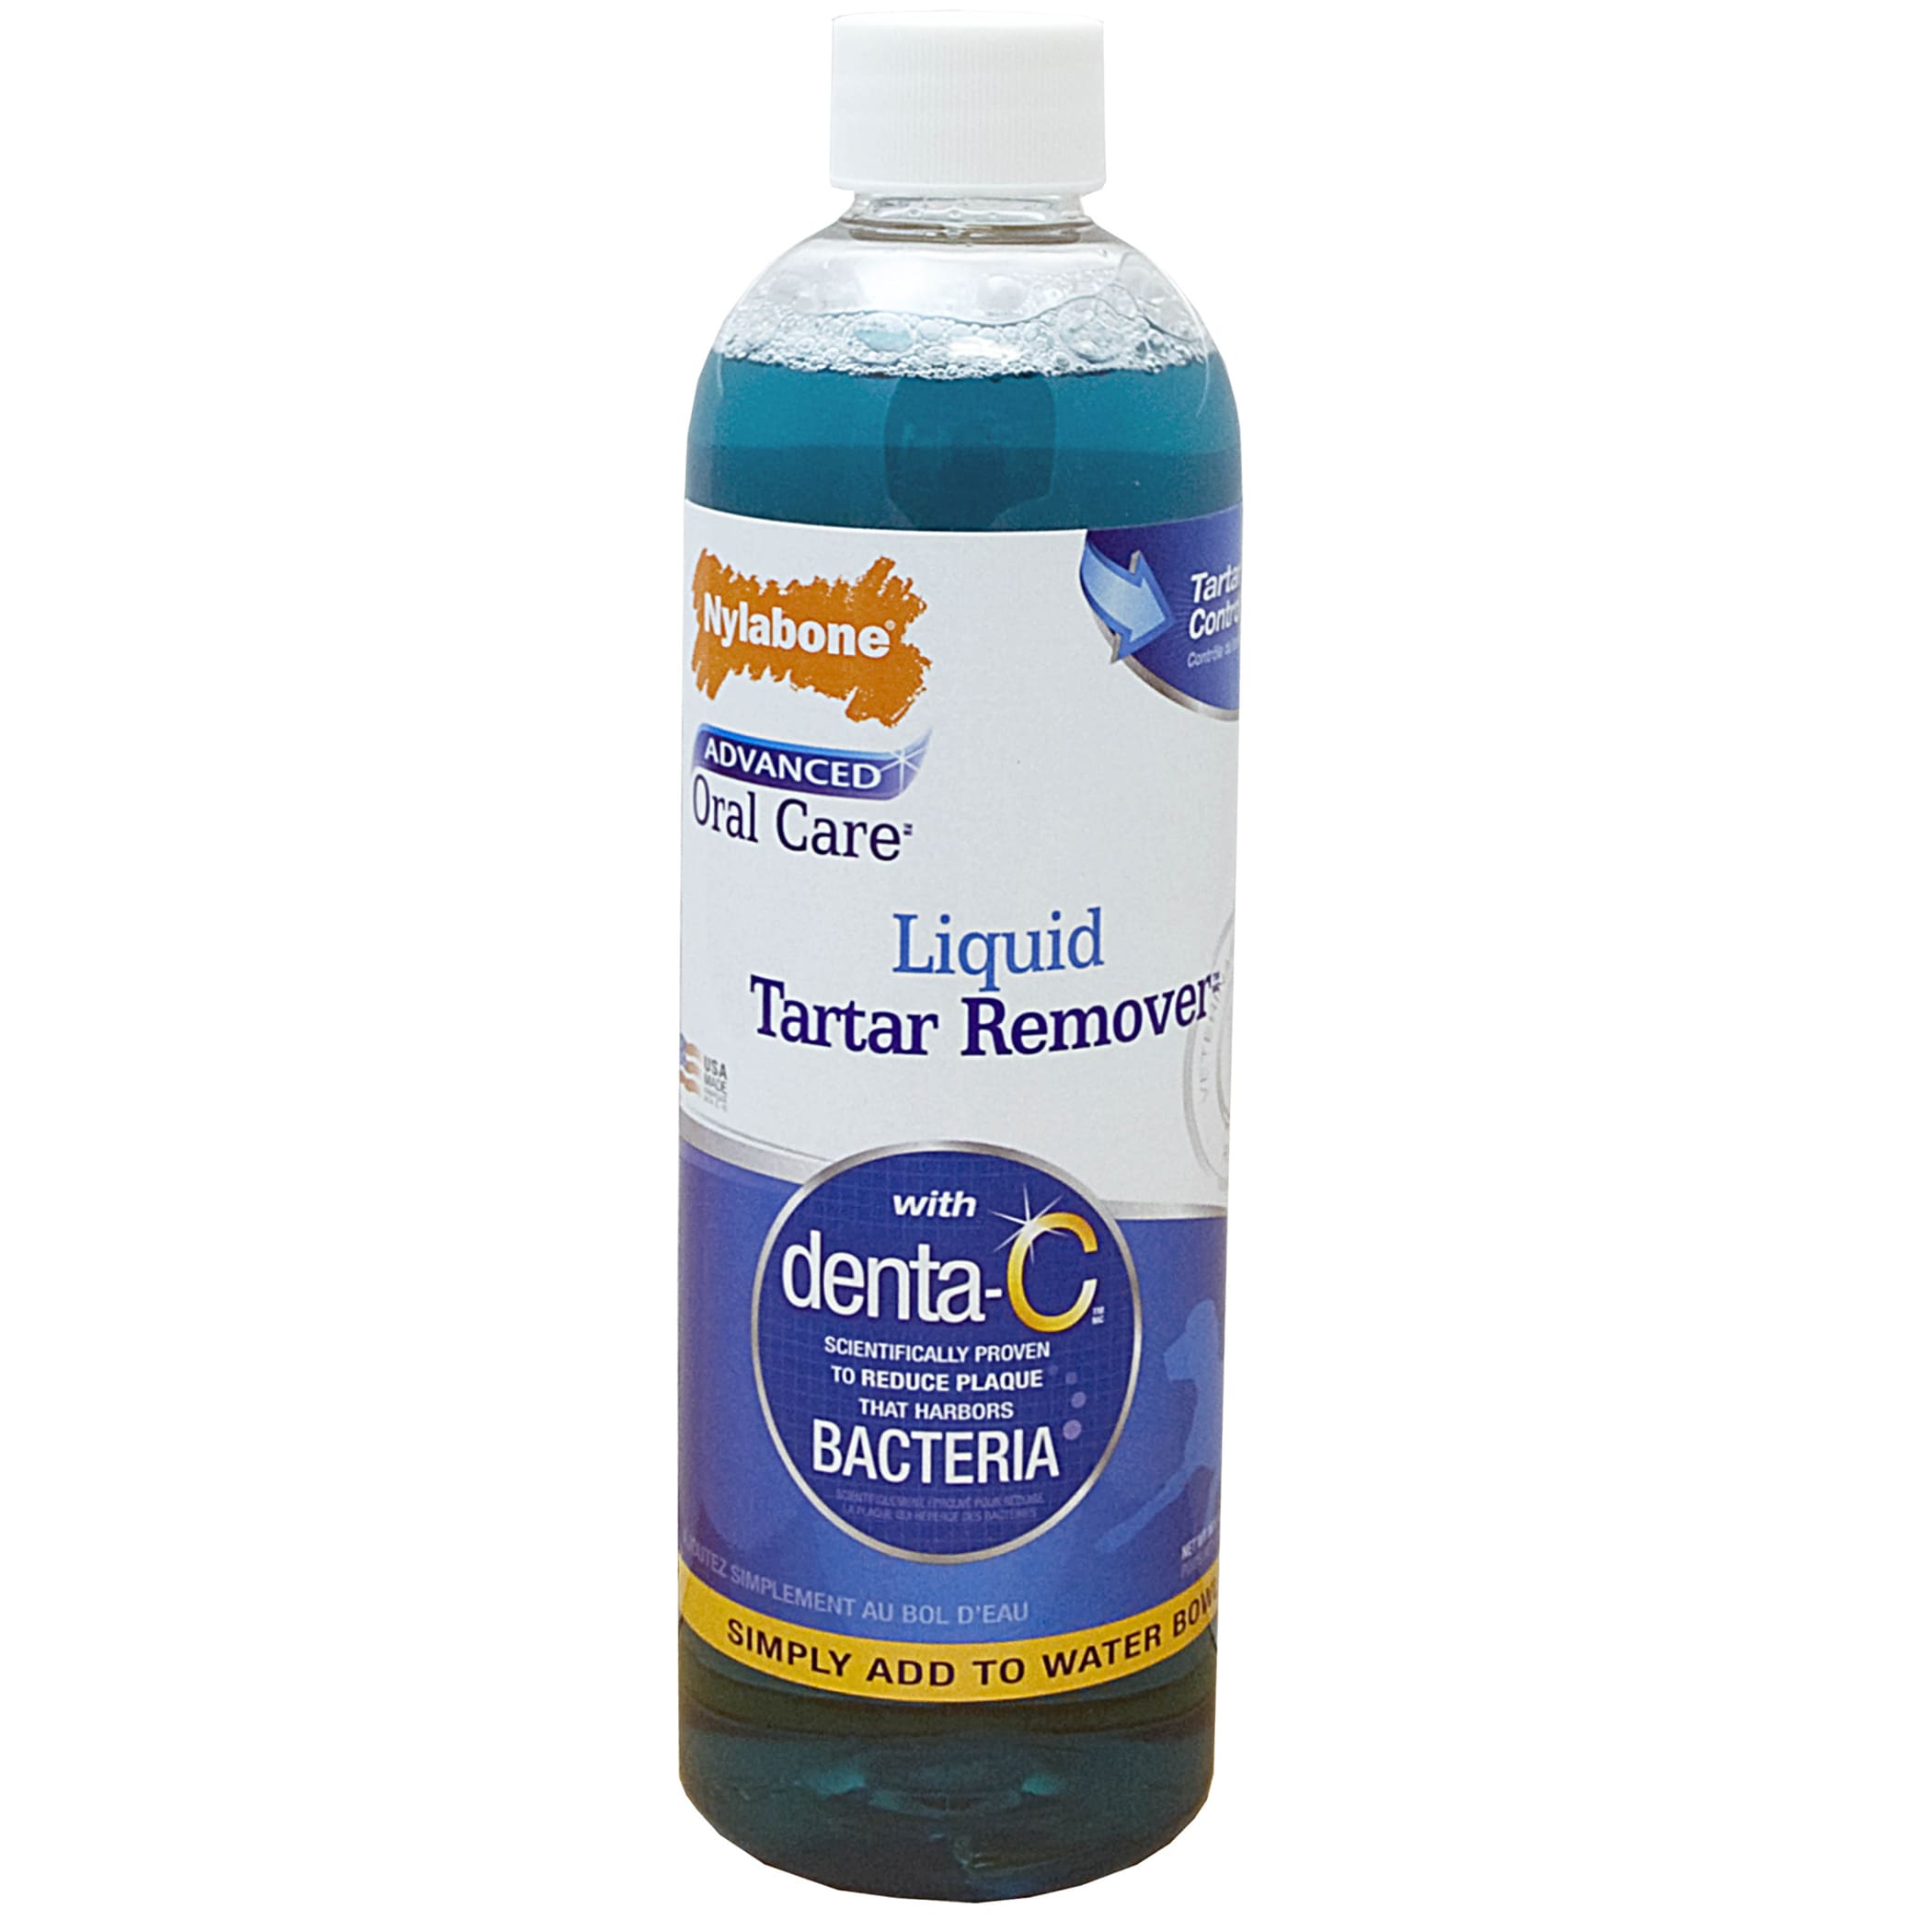 Nylabone Advanced Oral Care Liquid Tartar Remover (16oz),...